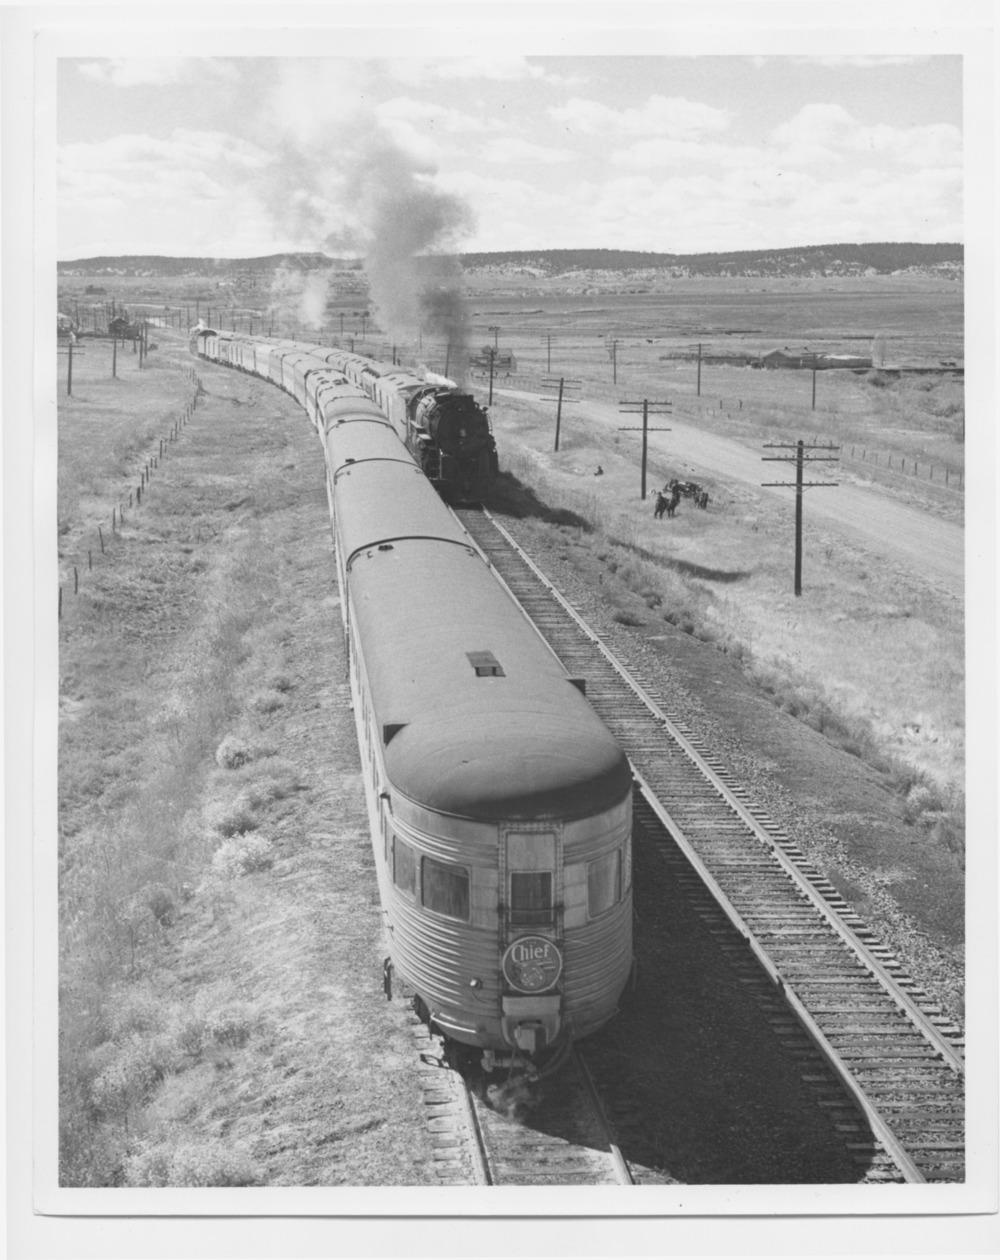 Atchison, Topeka and Santa Fe Railway Company Chiefs - 1